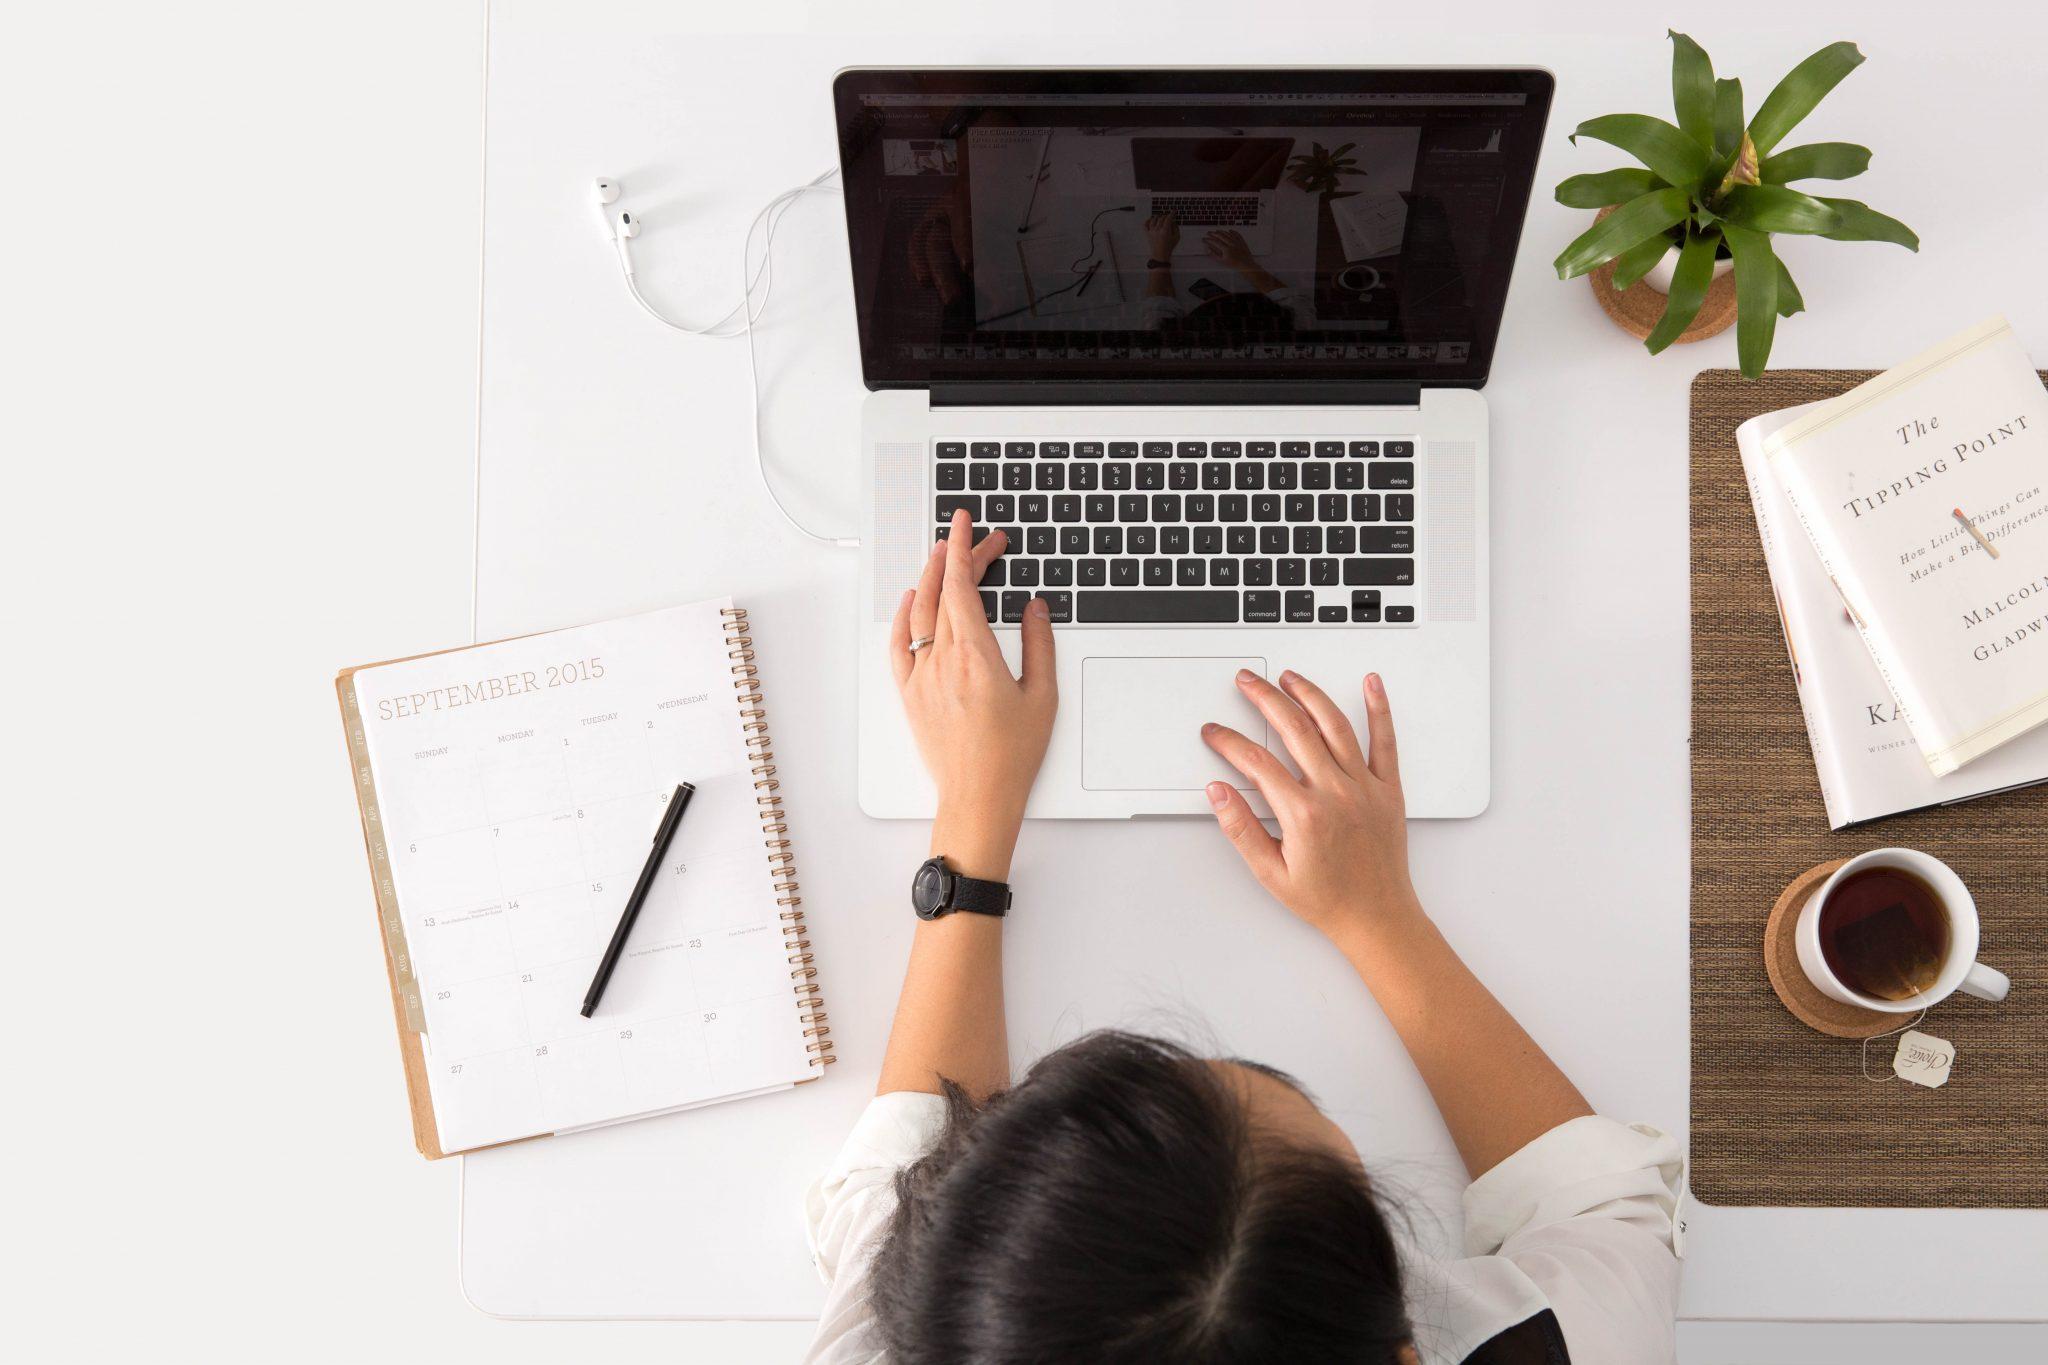 perks of online learning - affordable home fiber plan - streamtech (2)